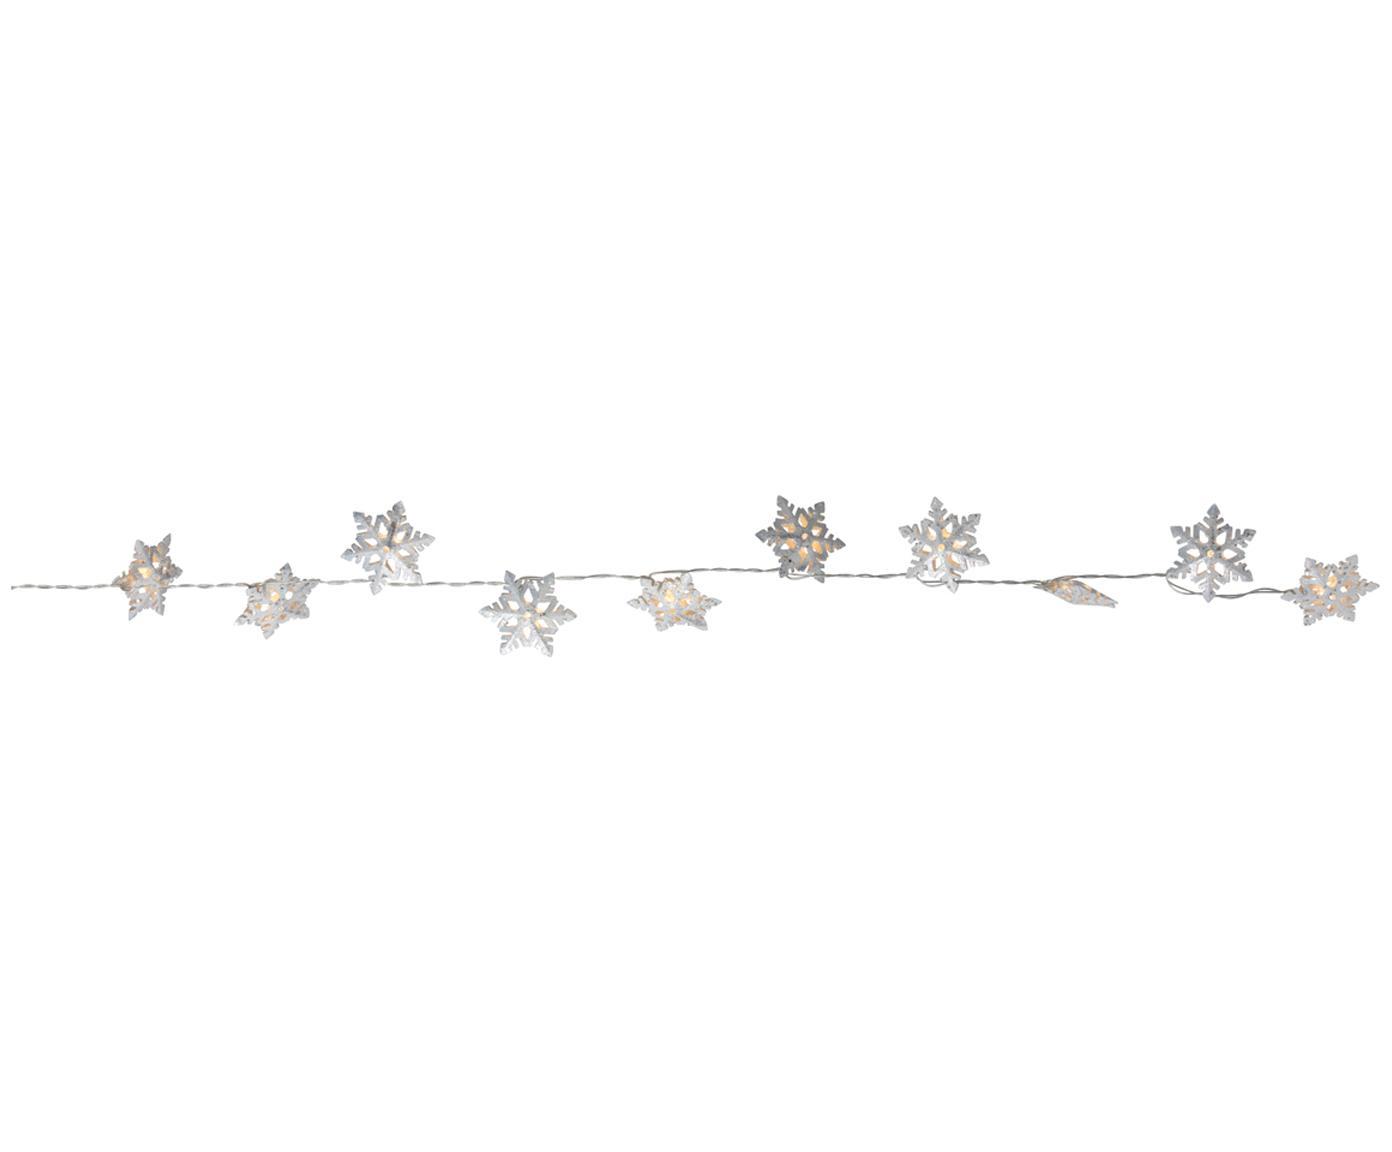 LED Lichterkette Flinga, Metall, Weiß, L 190 cm